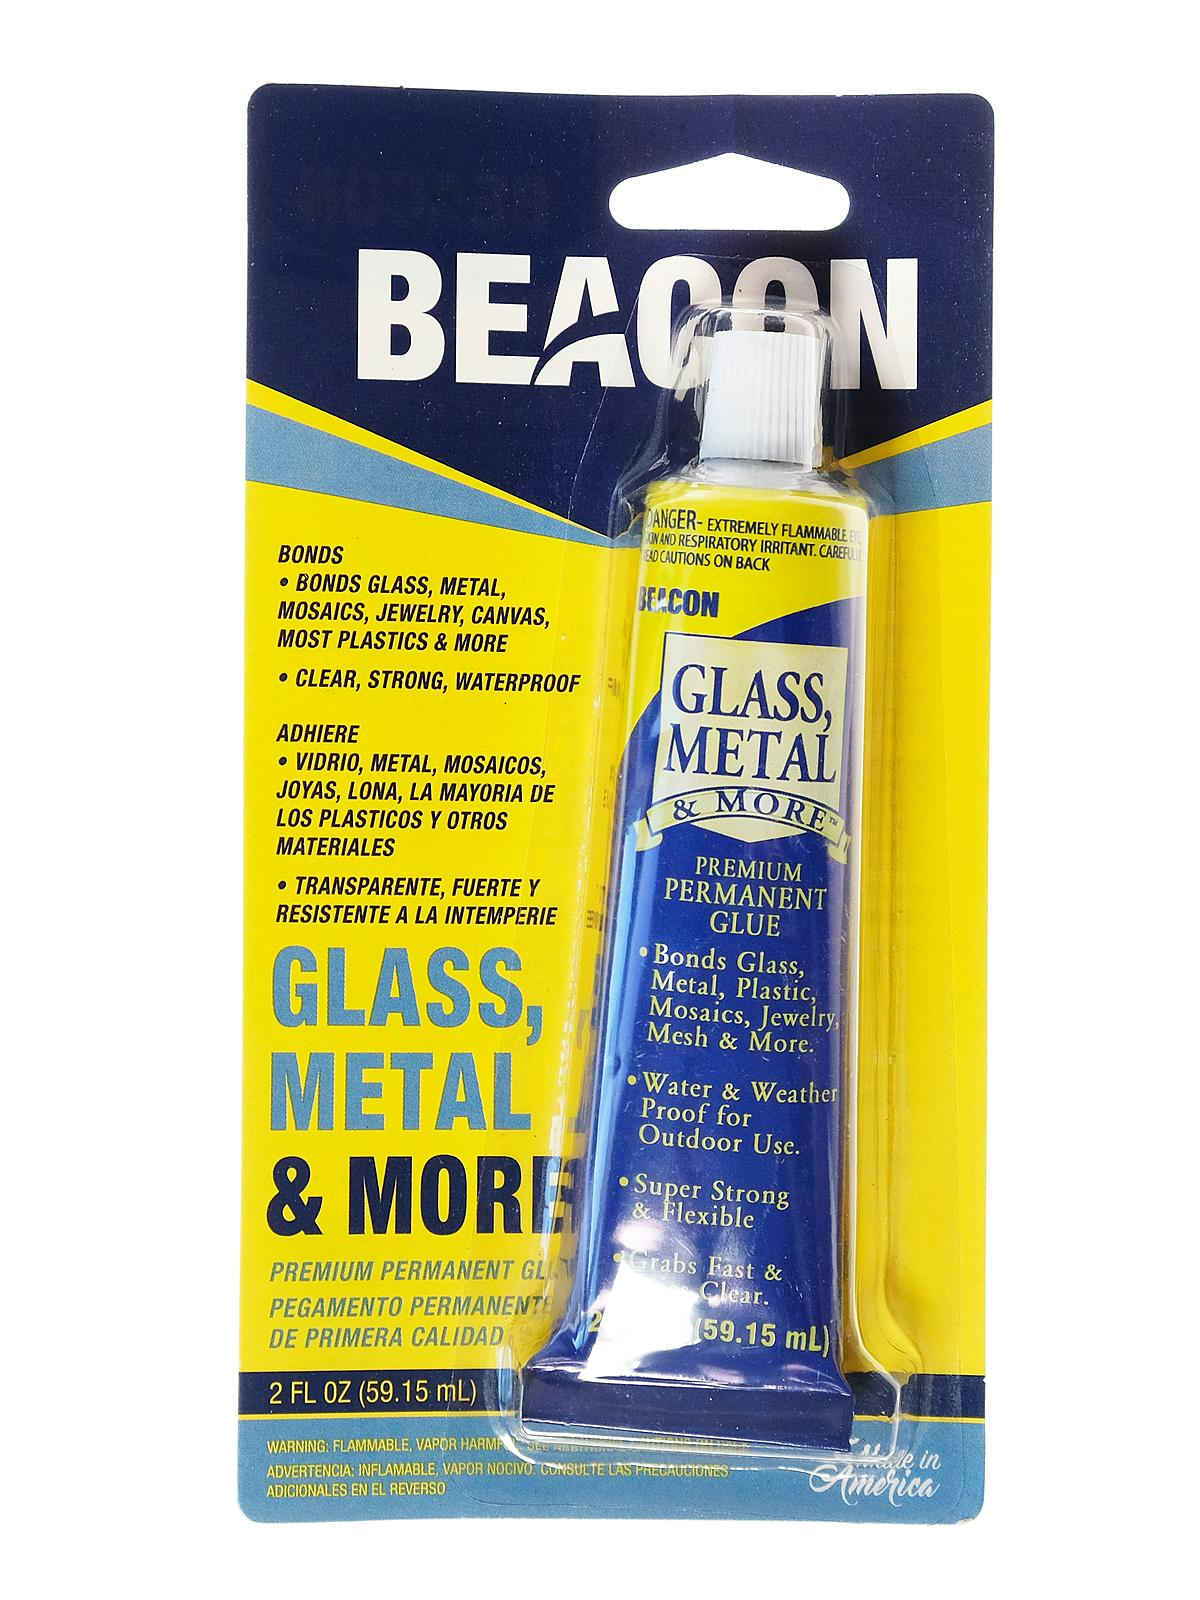 Glass, Metal And More Premium Permanent Glue 2 Oz.